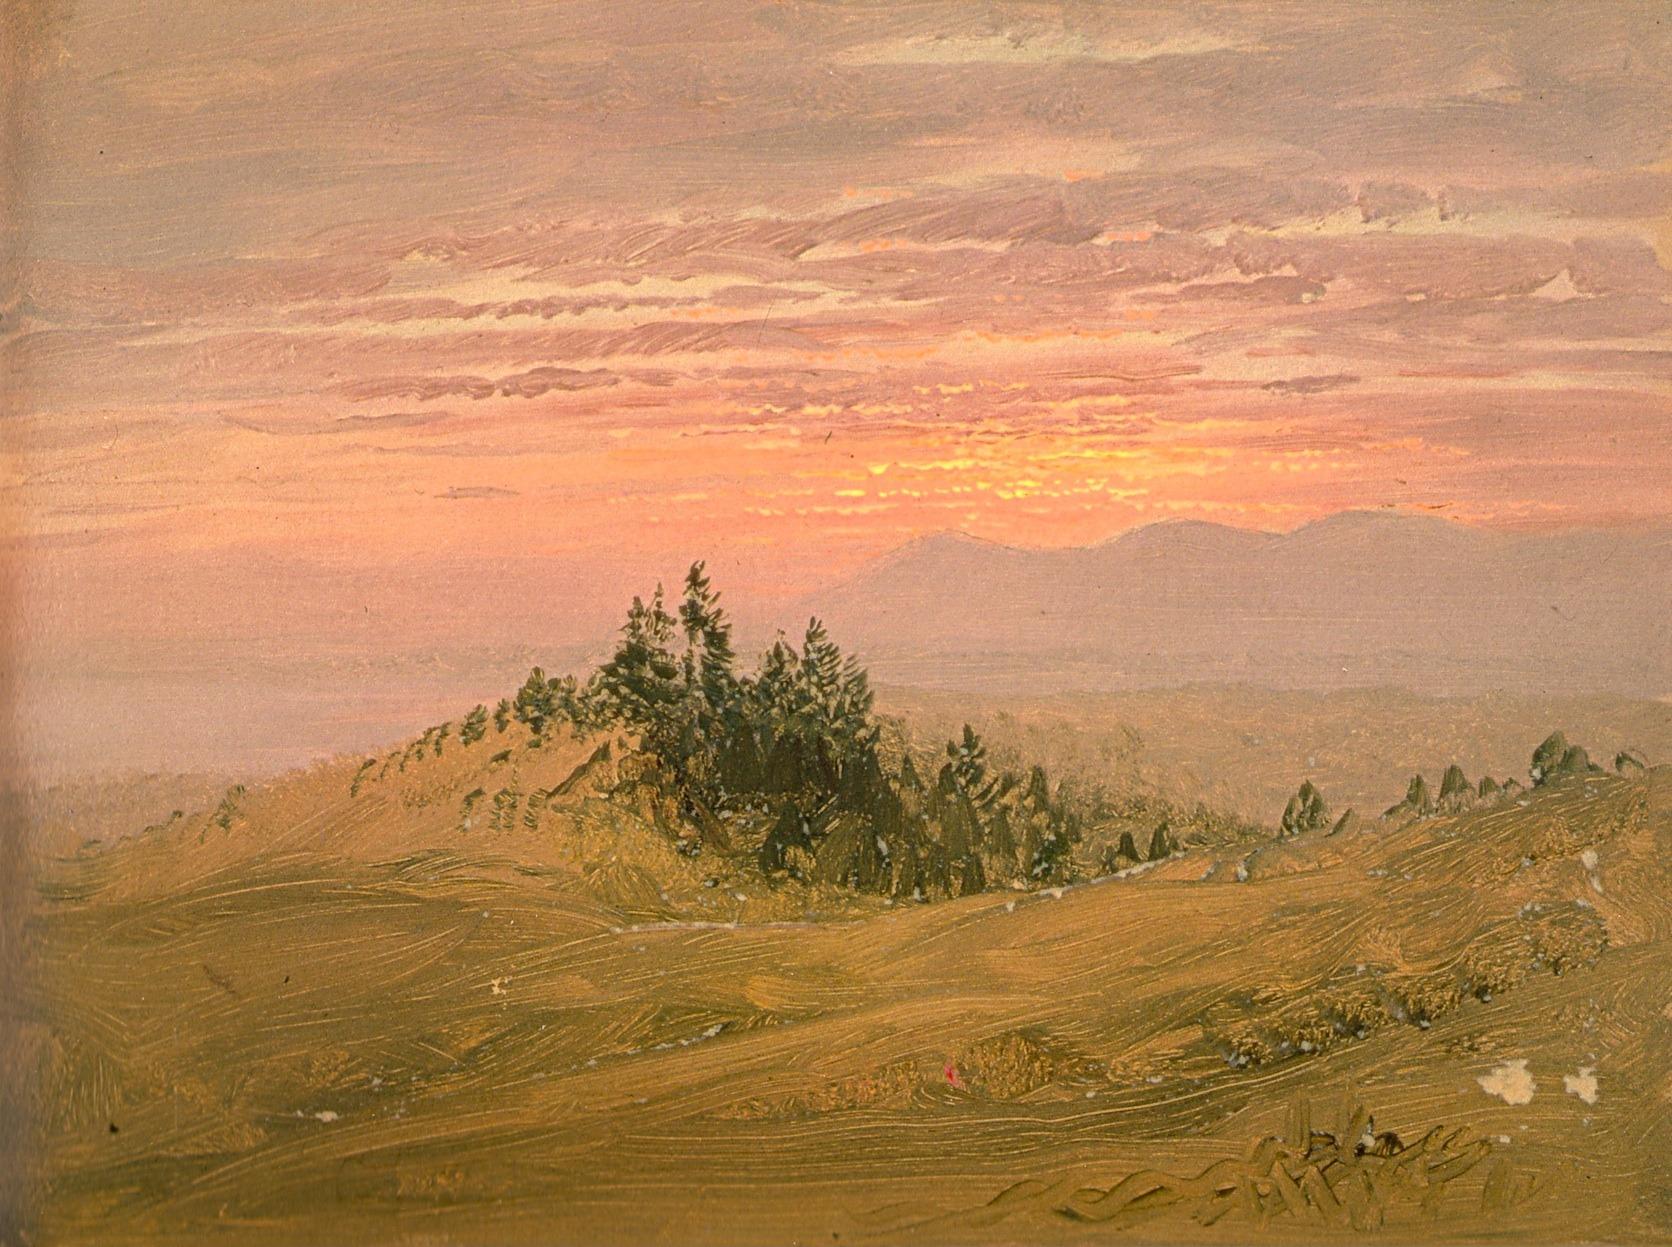 Sunset & Catskills from Church Hill, Olana